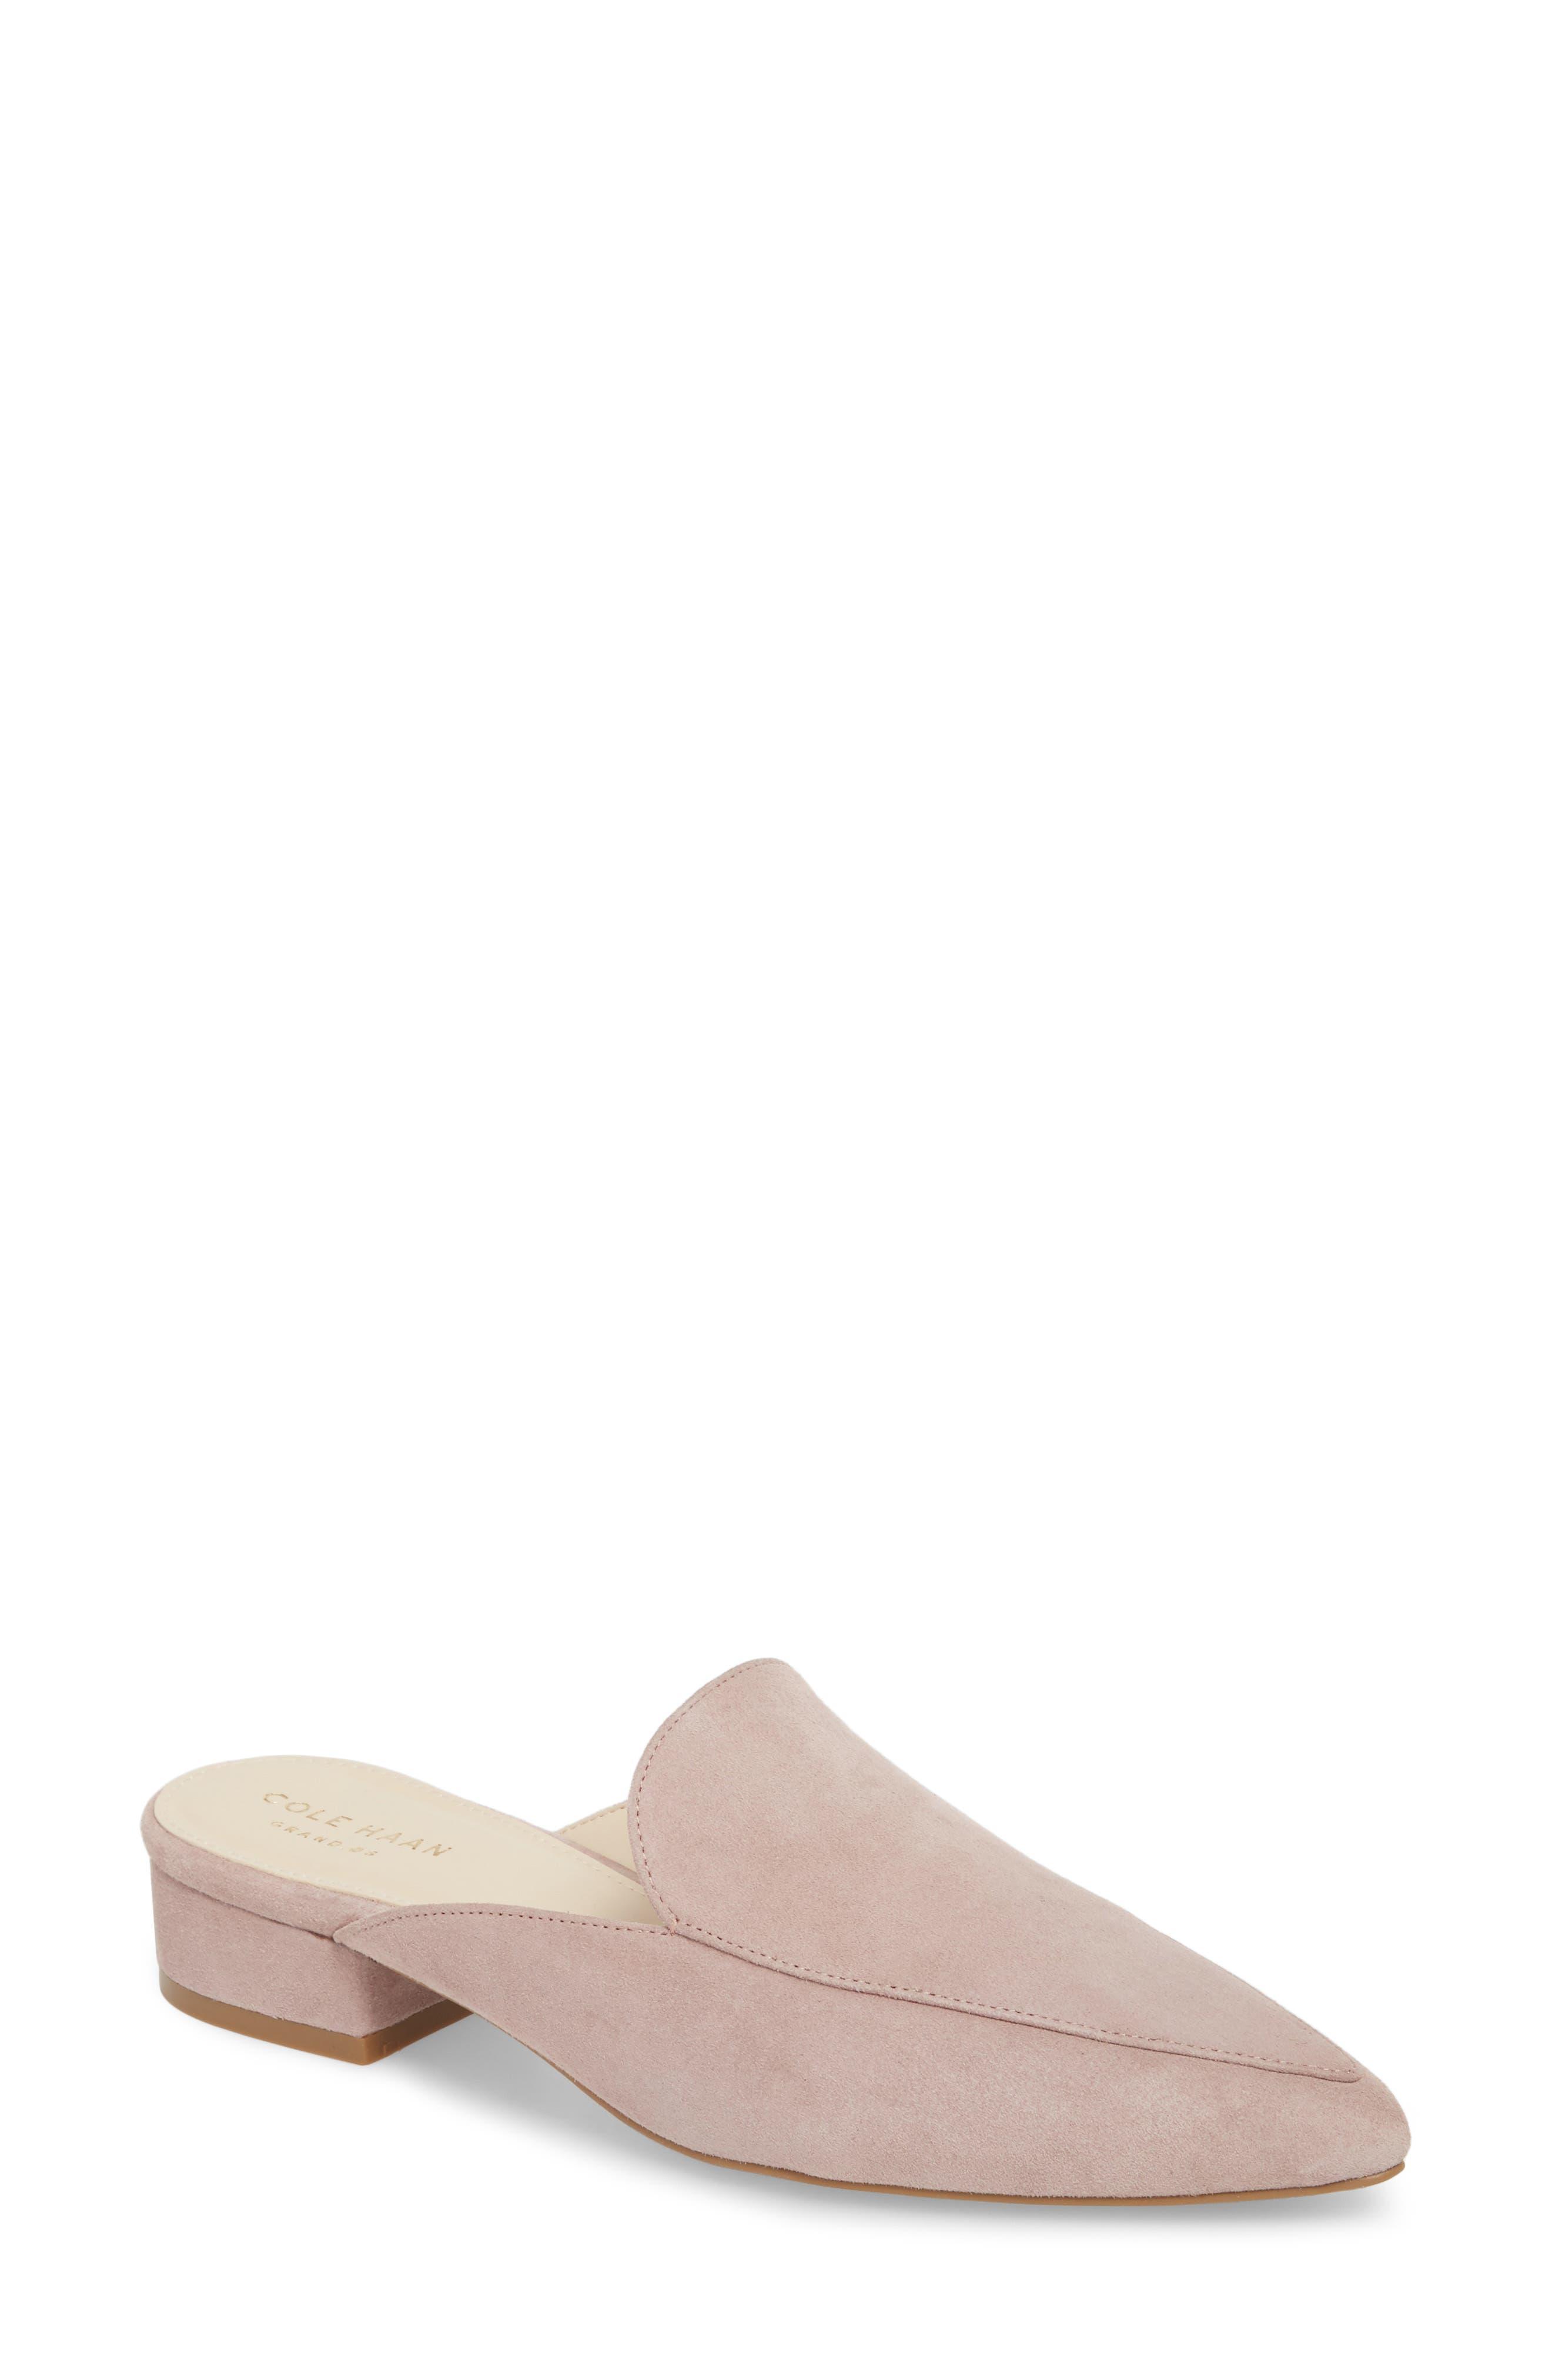 Piper Loafer Mule,                         Main,                         color, Twilight Mauve Suede